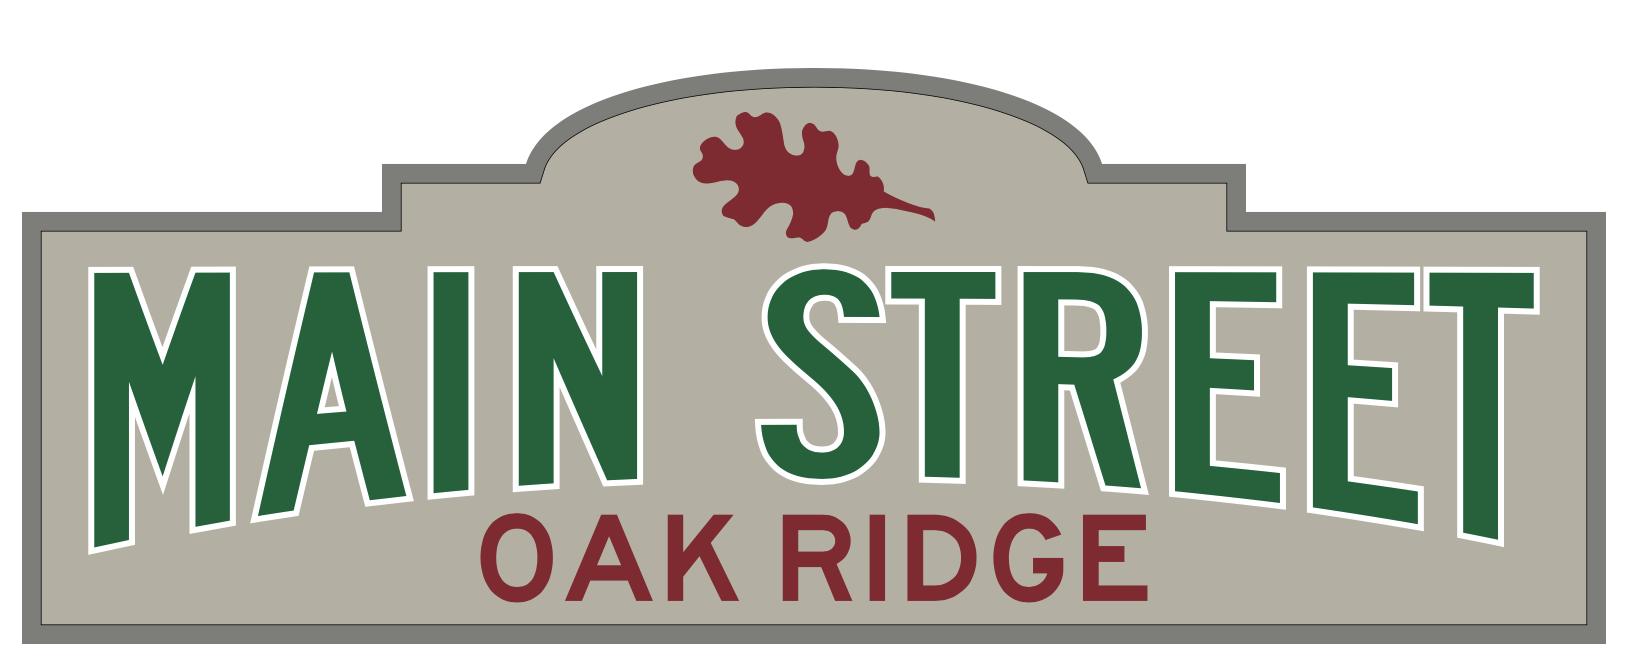 Oak Ridge Shopping And Retail Stores